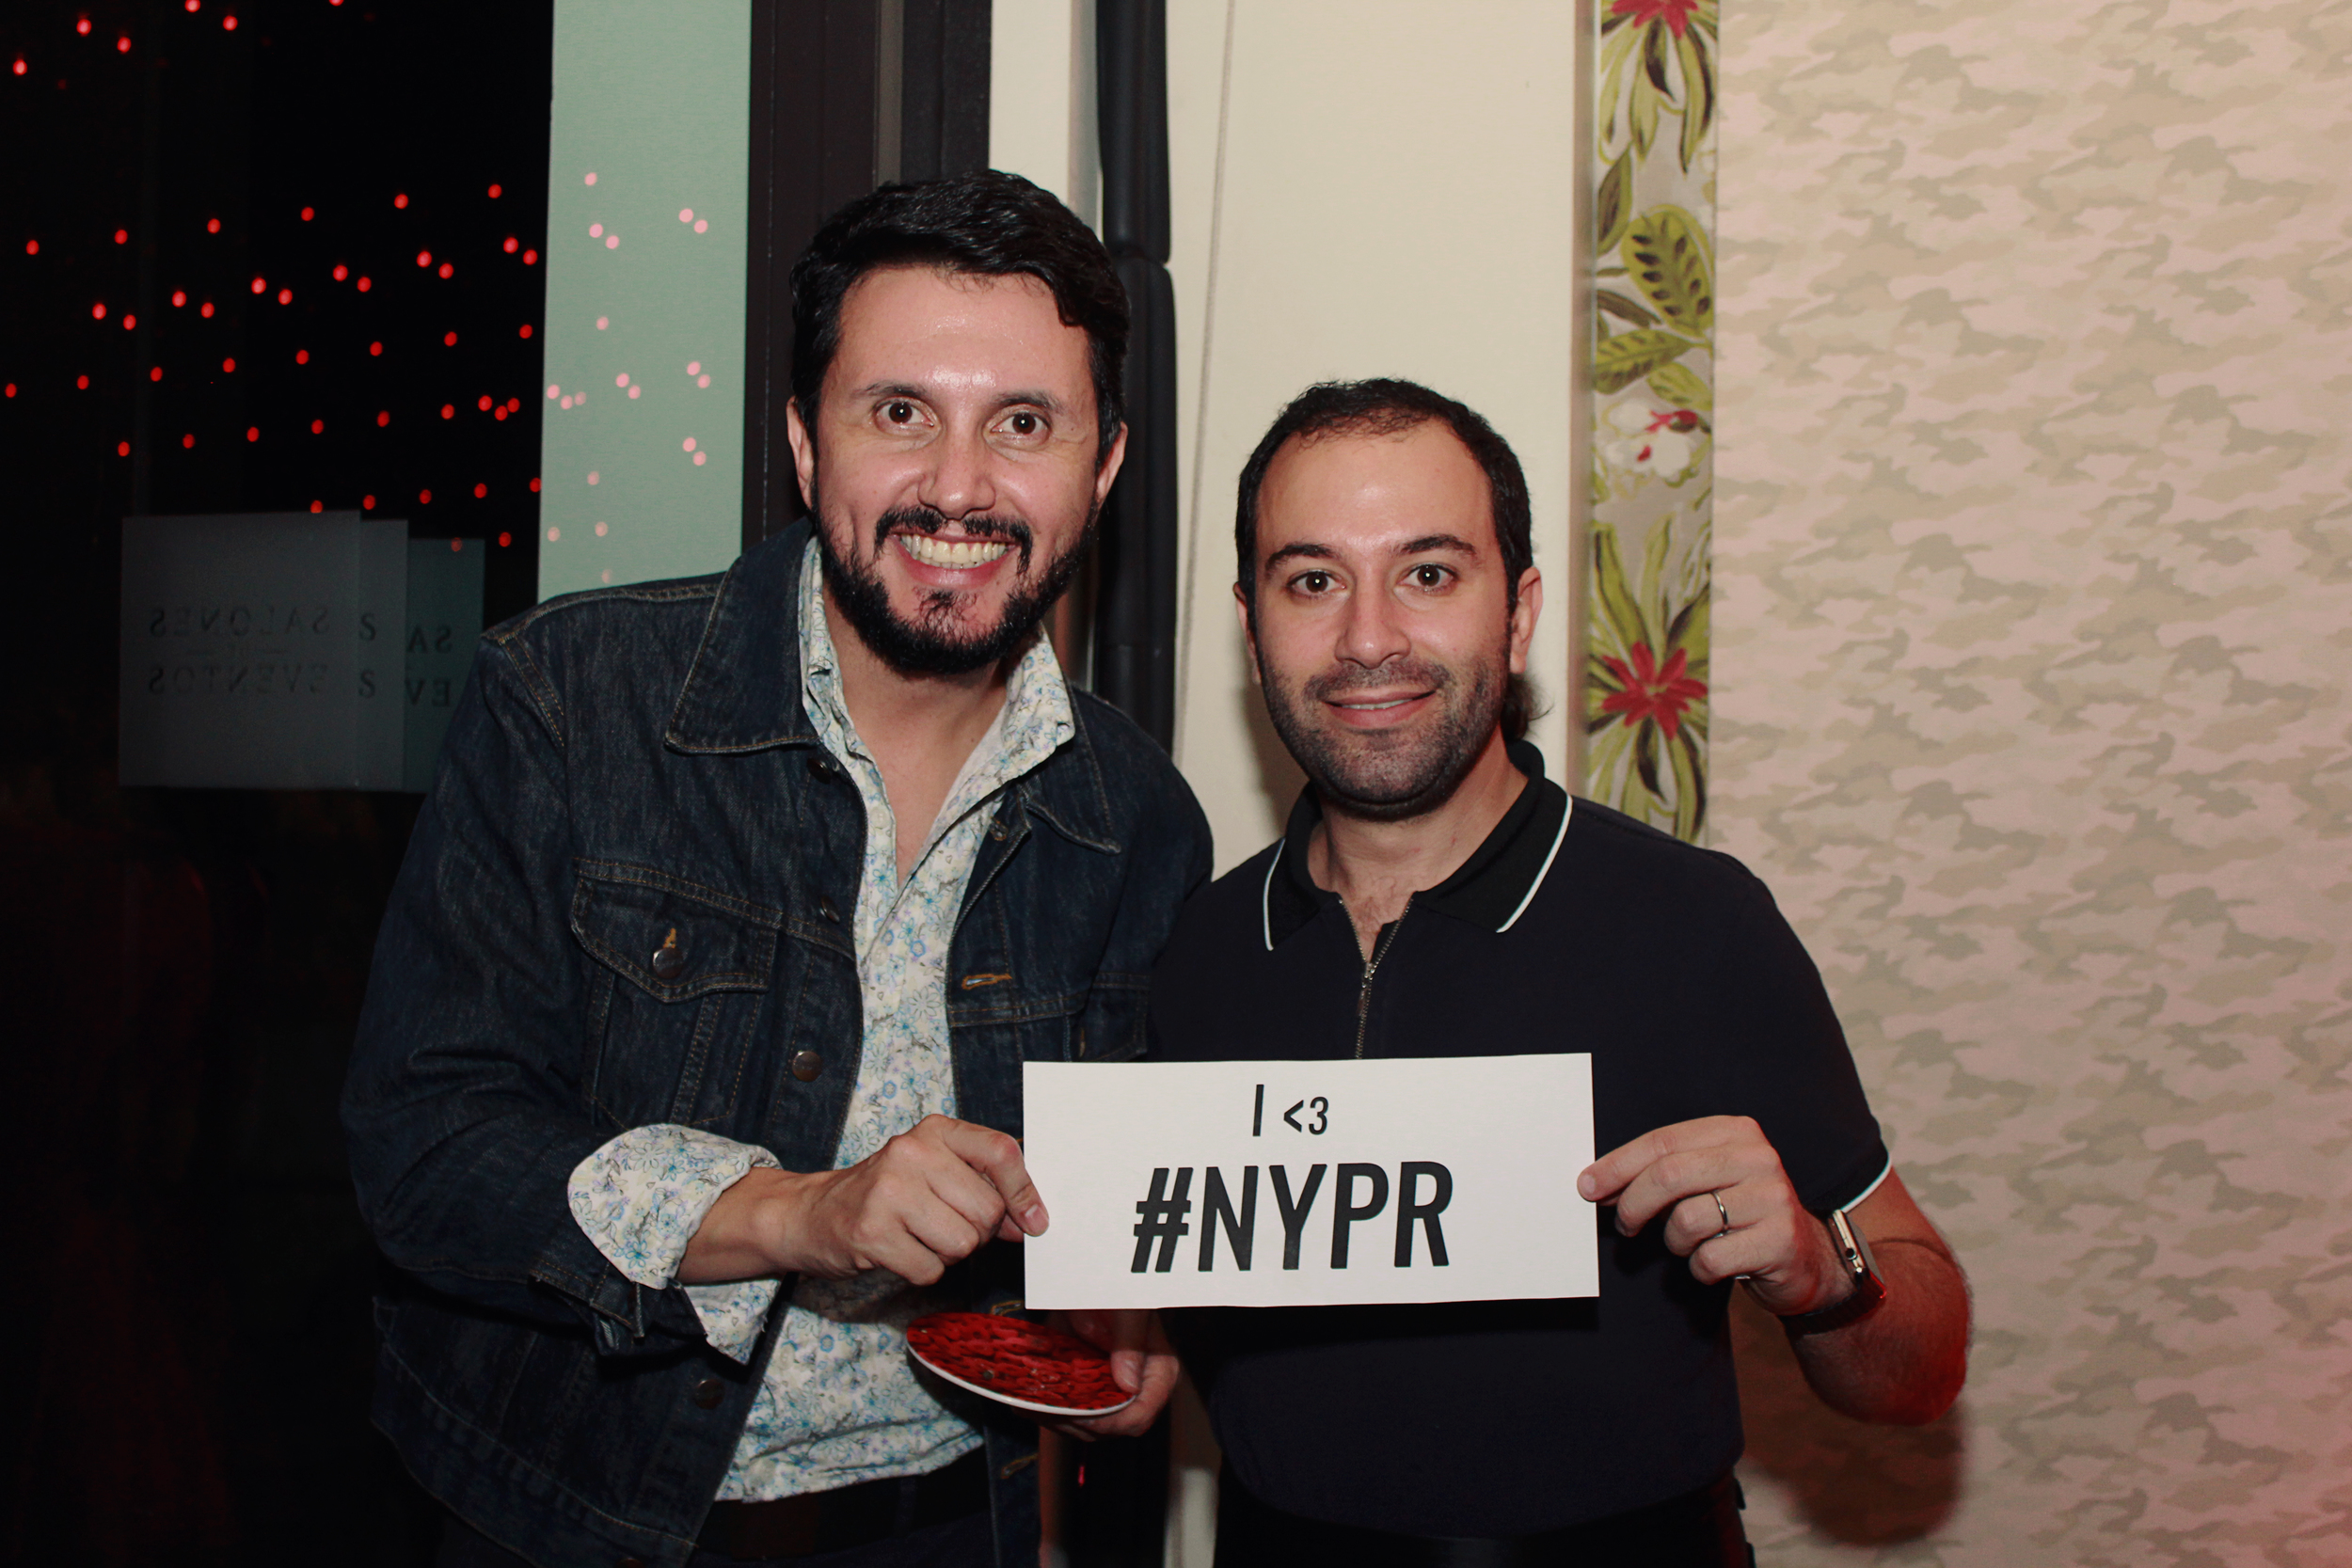 NYPR-PARTY-11.jpg